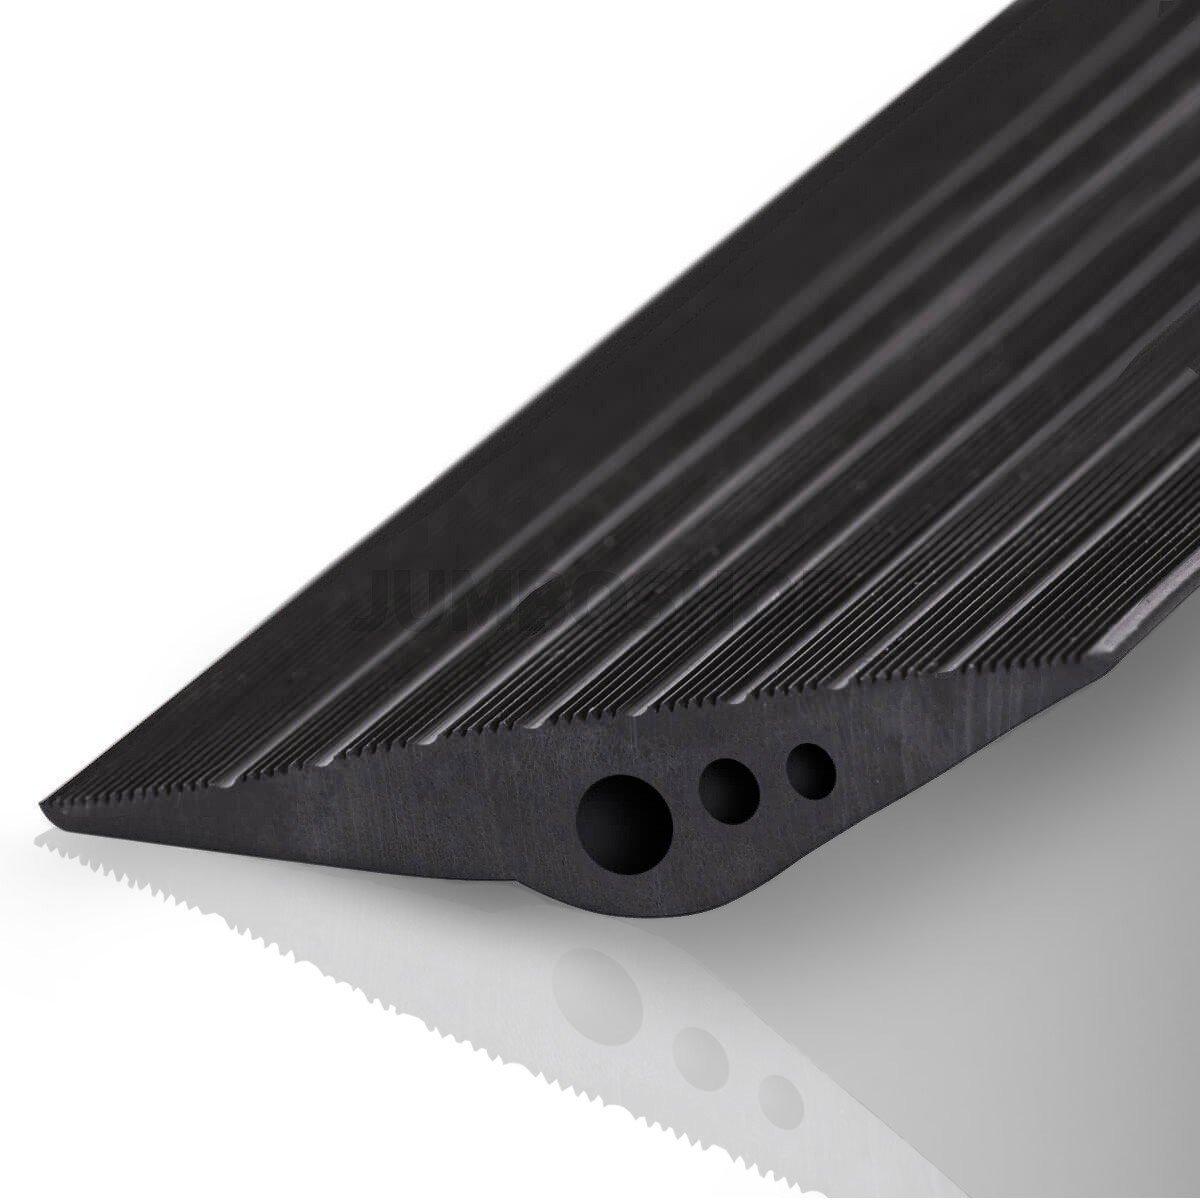 STEIGNER Junta de Garaje con Adhesivo de Montaje Umbral de Garaje de EPDM 5,5 m 14 mm x 78 mm SGD01